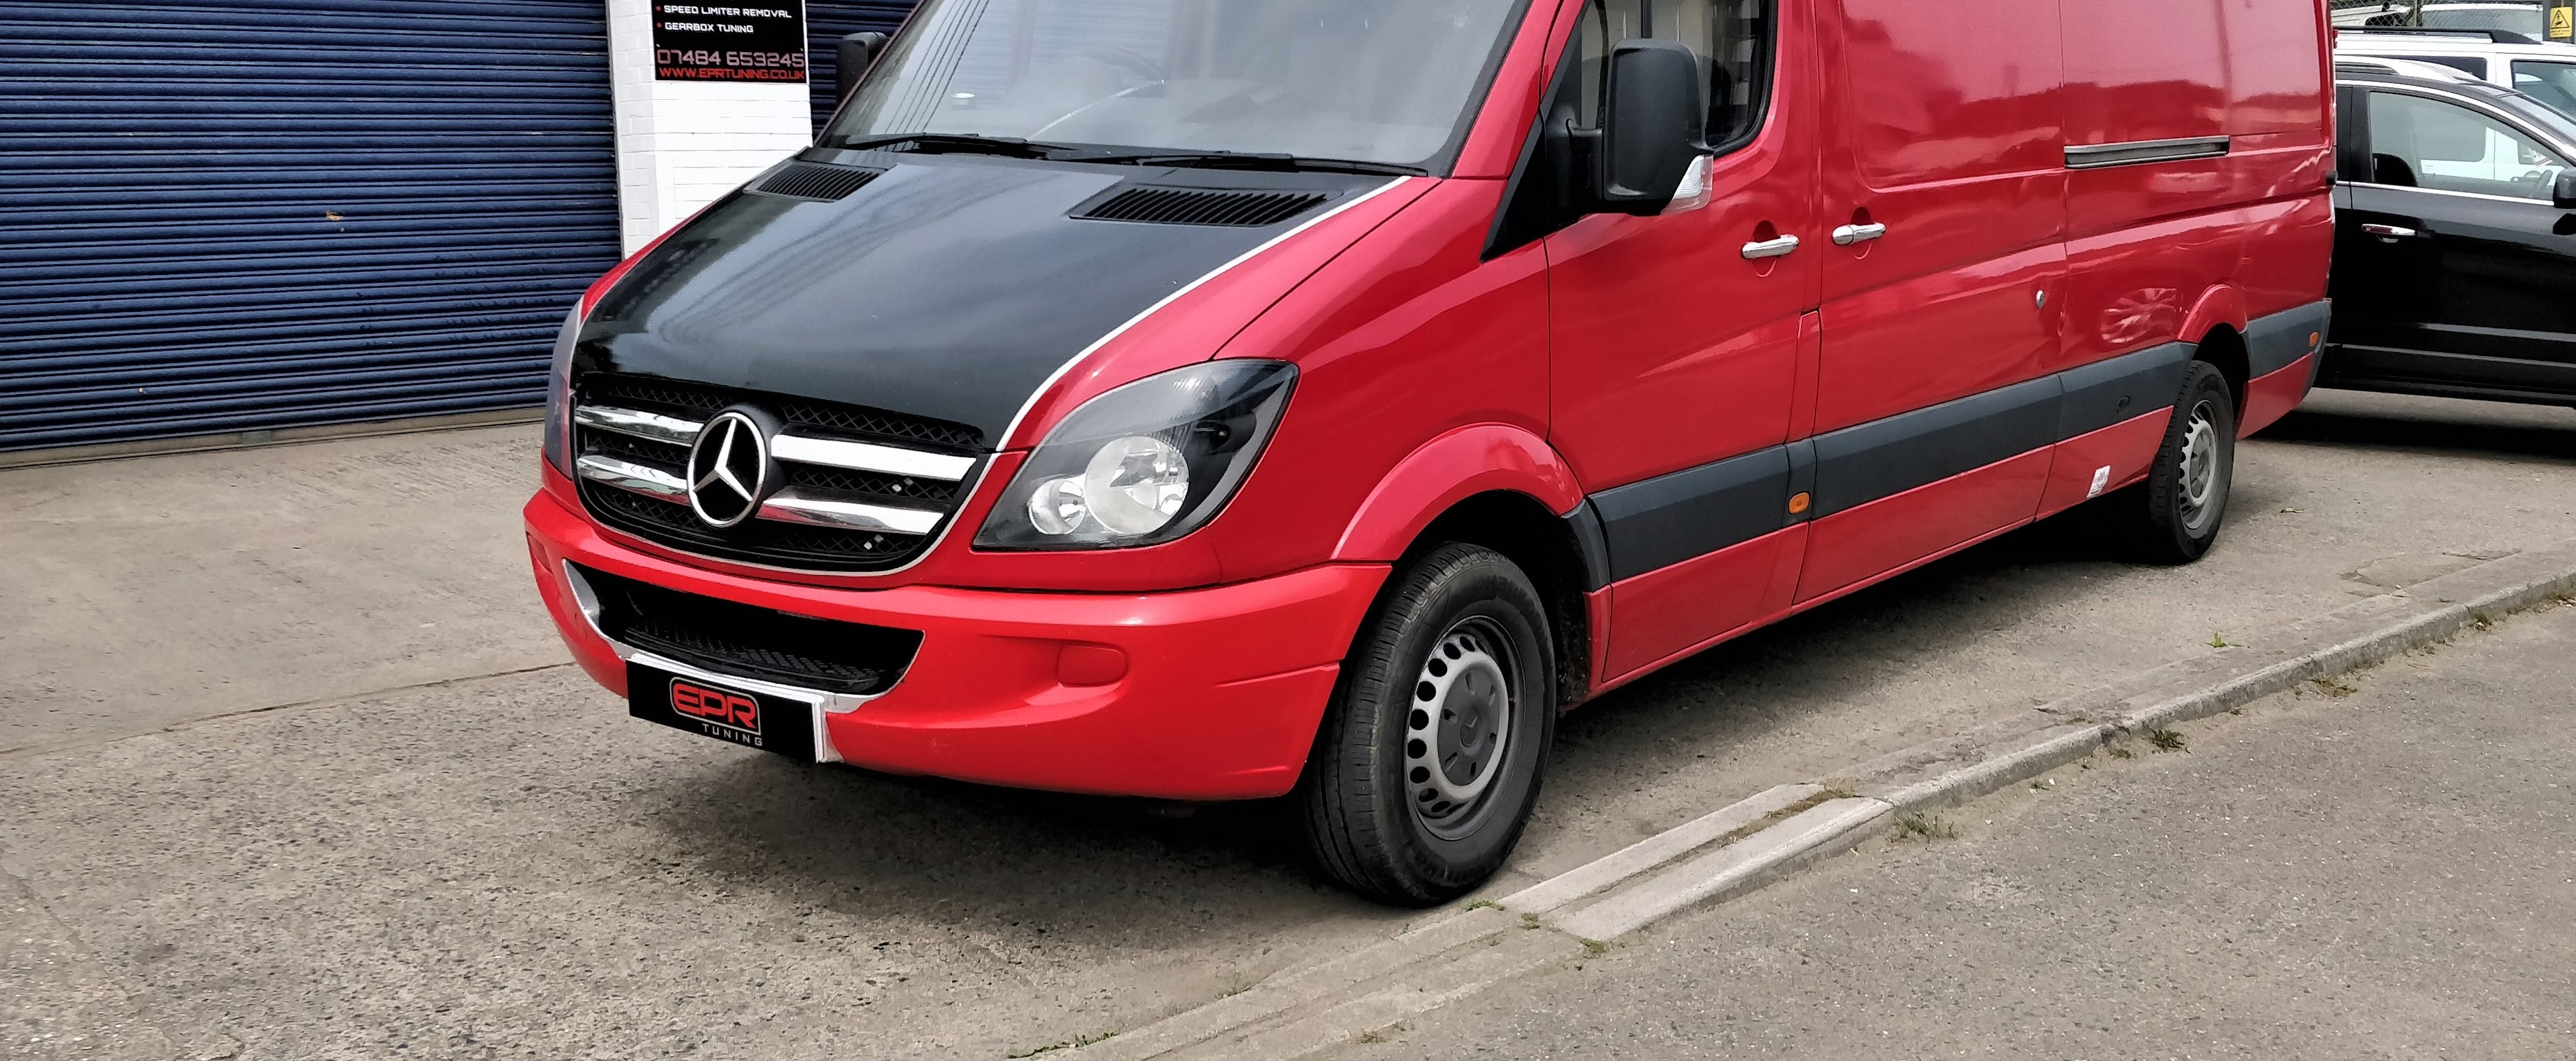 Speed Limiter Removal | Devon | Cornwall | Somersert | EPR Tuning